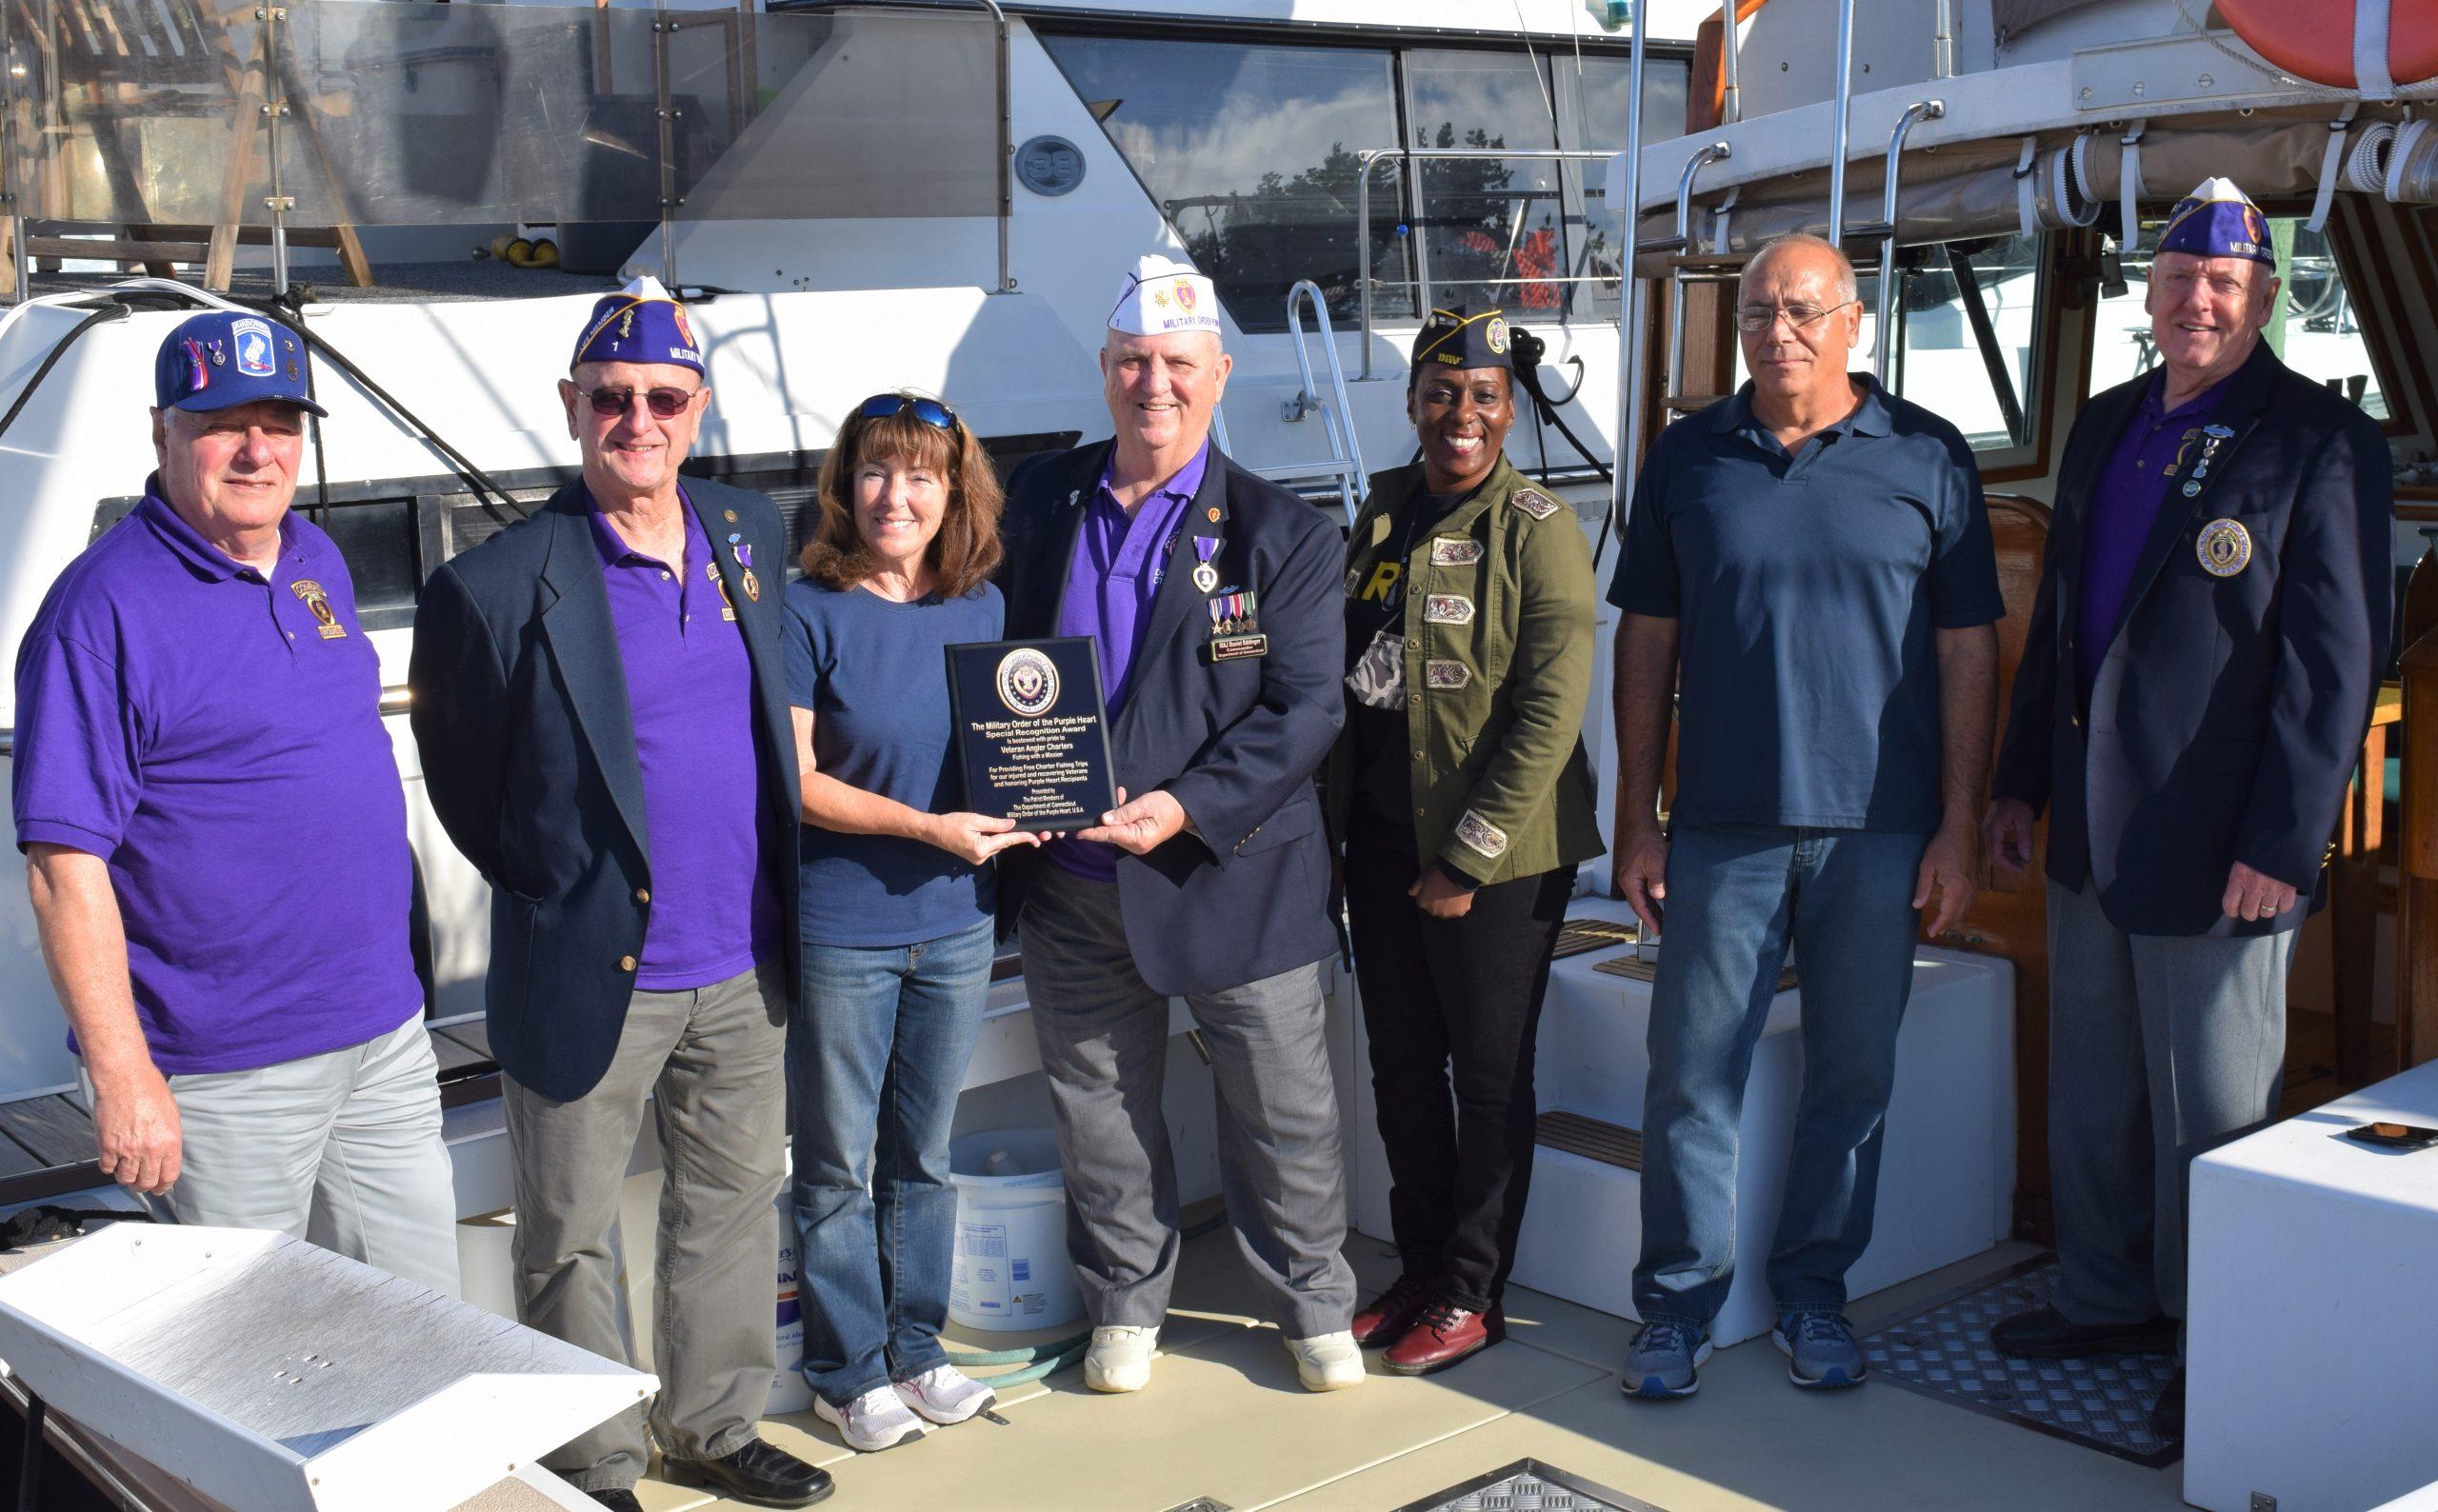 Veterans' groups honor Granfield